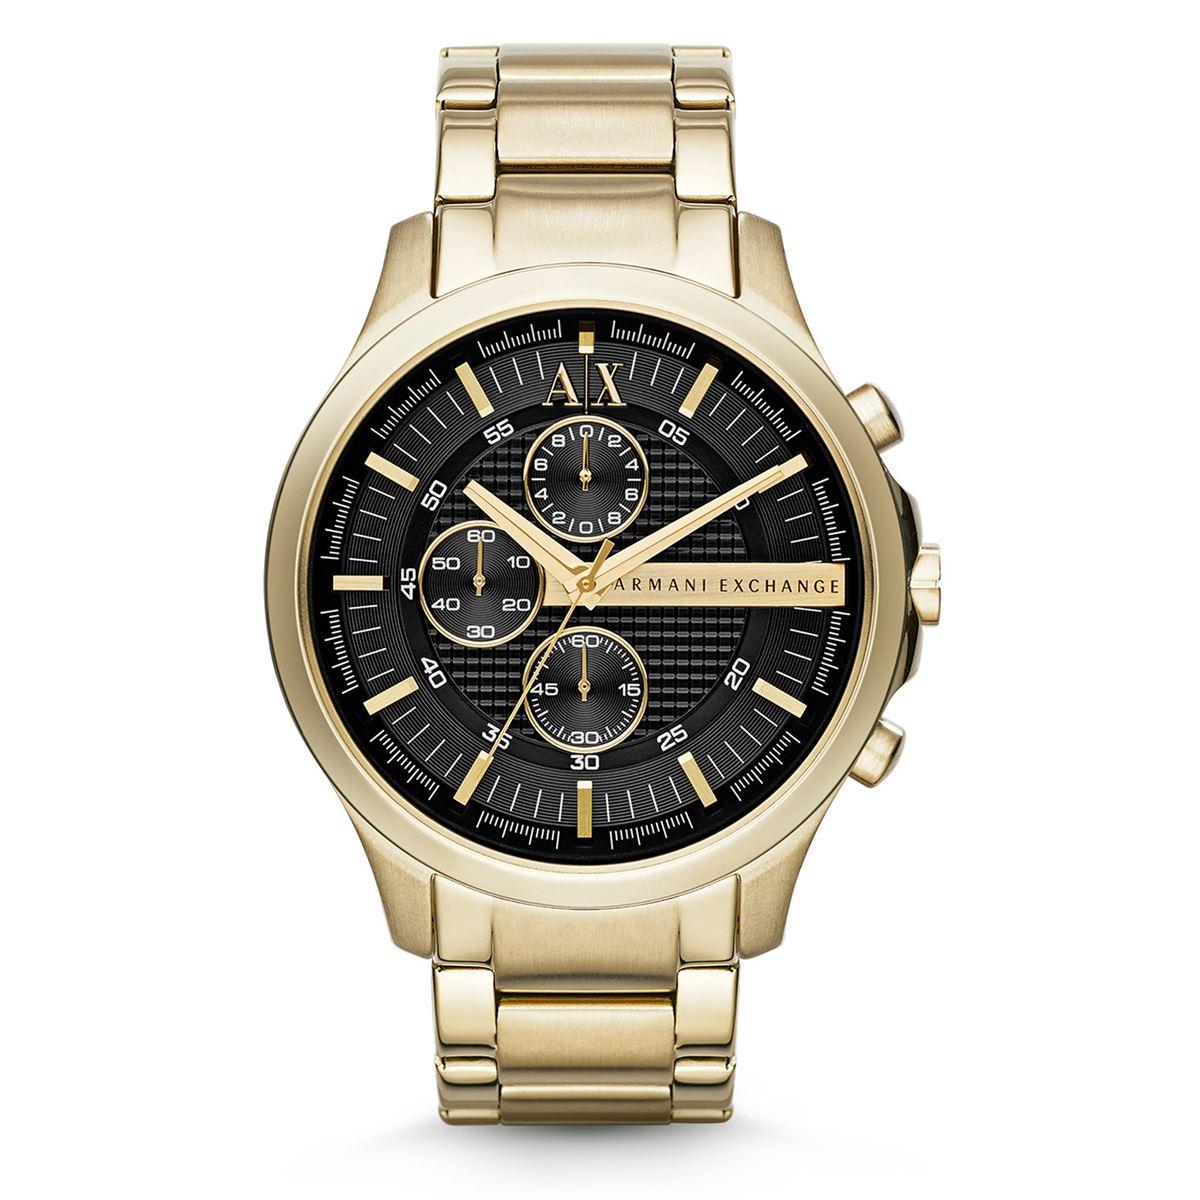 d51ad3ea56f3 Reloj armani exchange ax2137